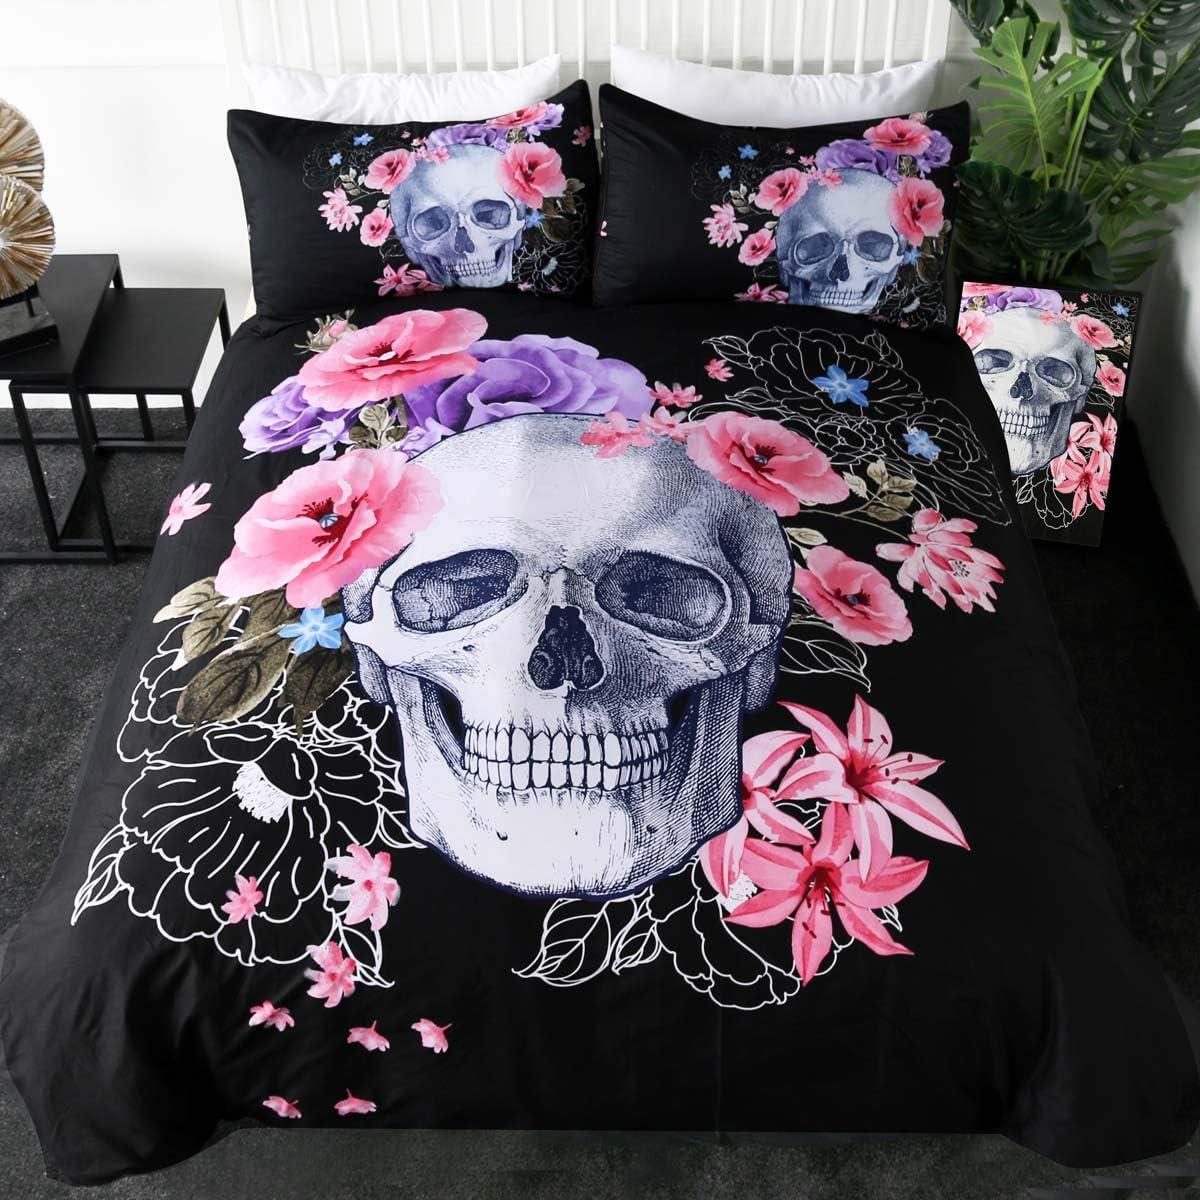 Sleepwish Poppy Rose Skull Bedding Set 3D Floral Skull Printed Duvet Cover 3 Pieces Black Purple Skeleton Bedspreads (Queen)